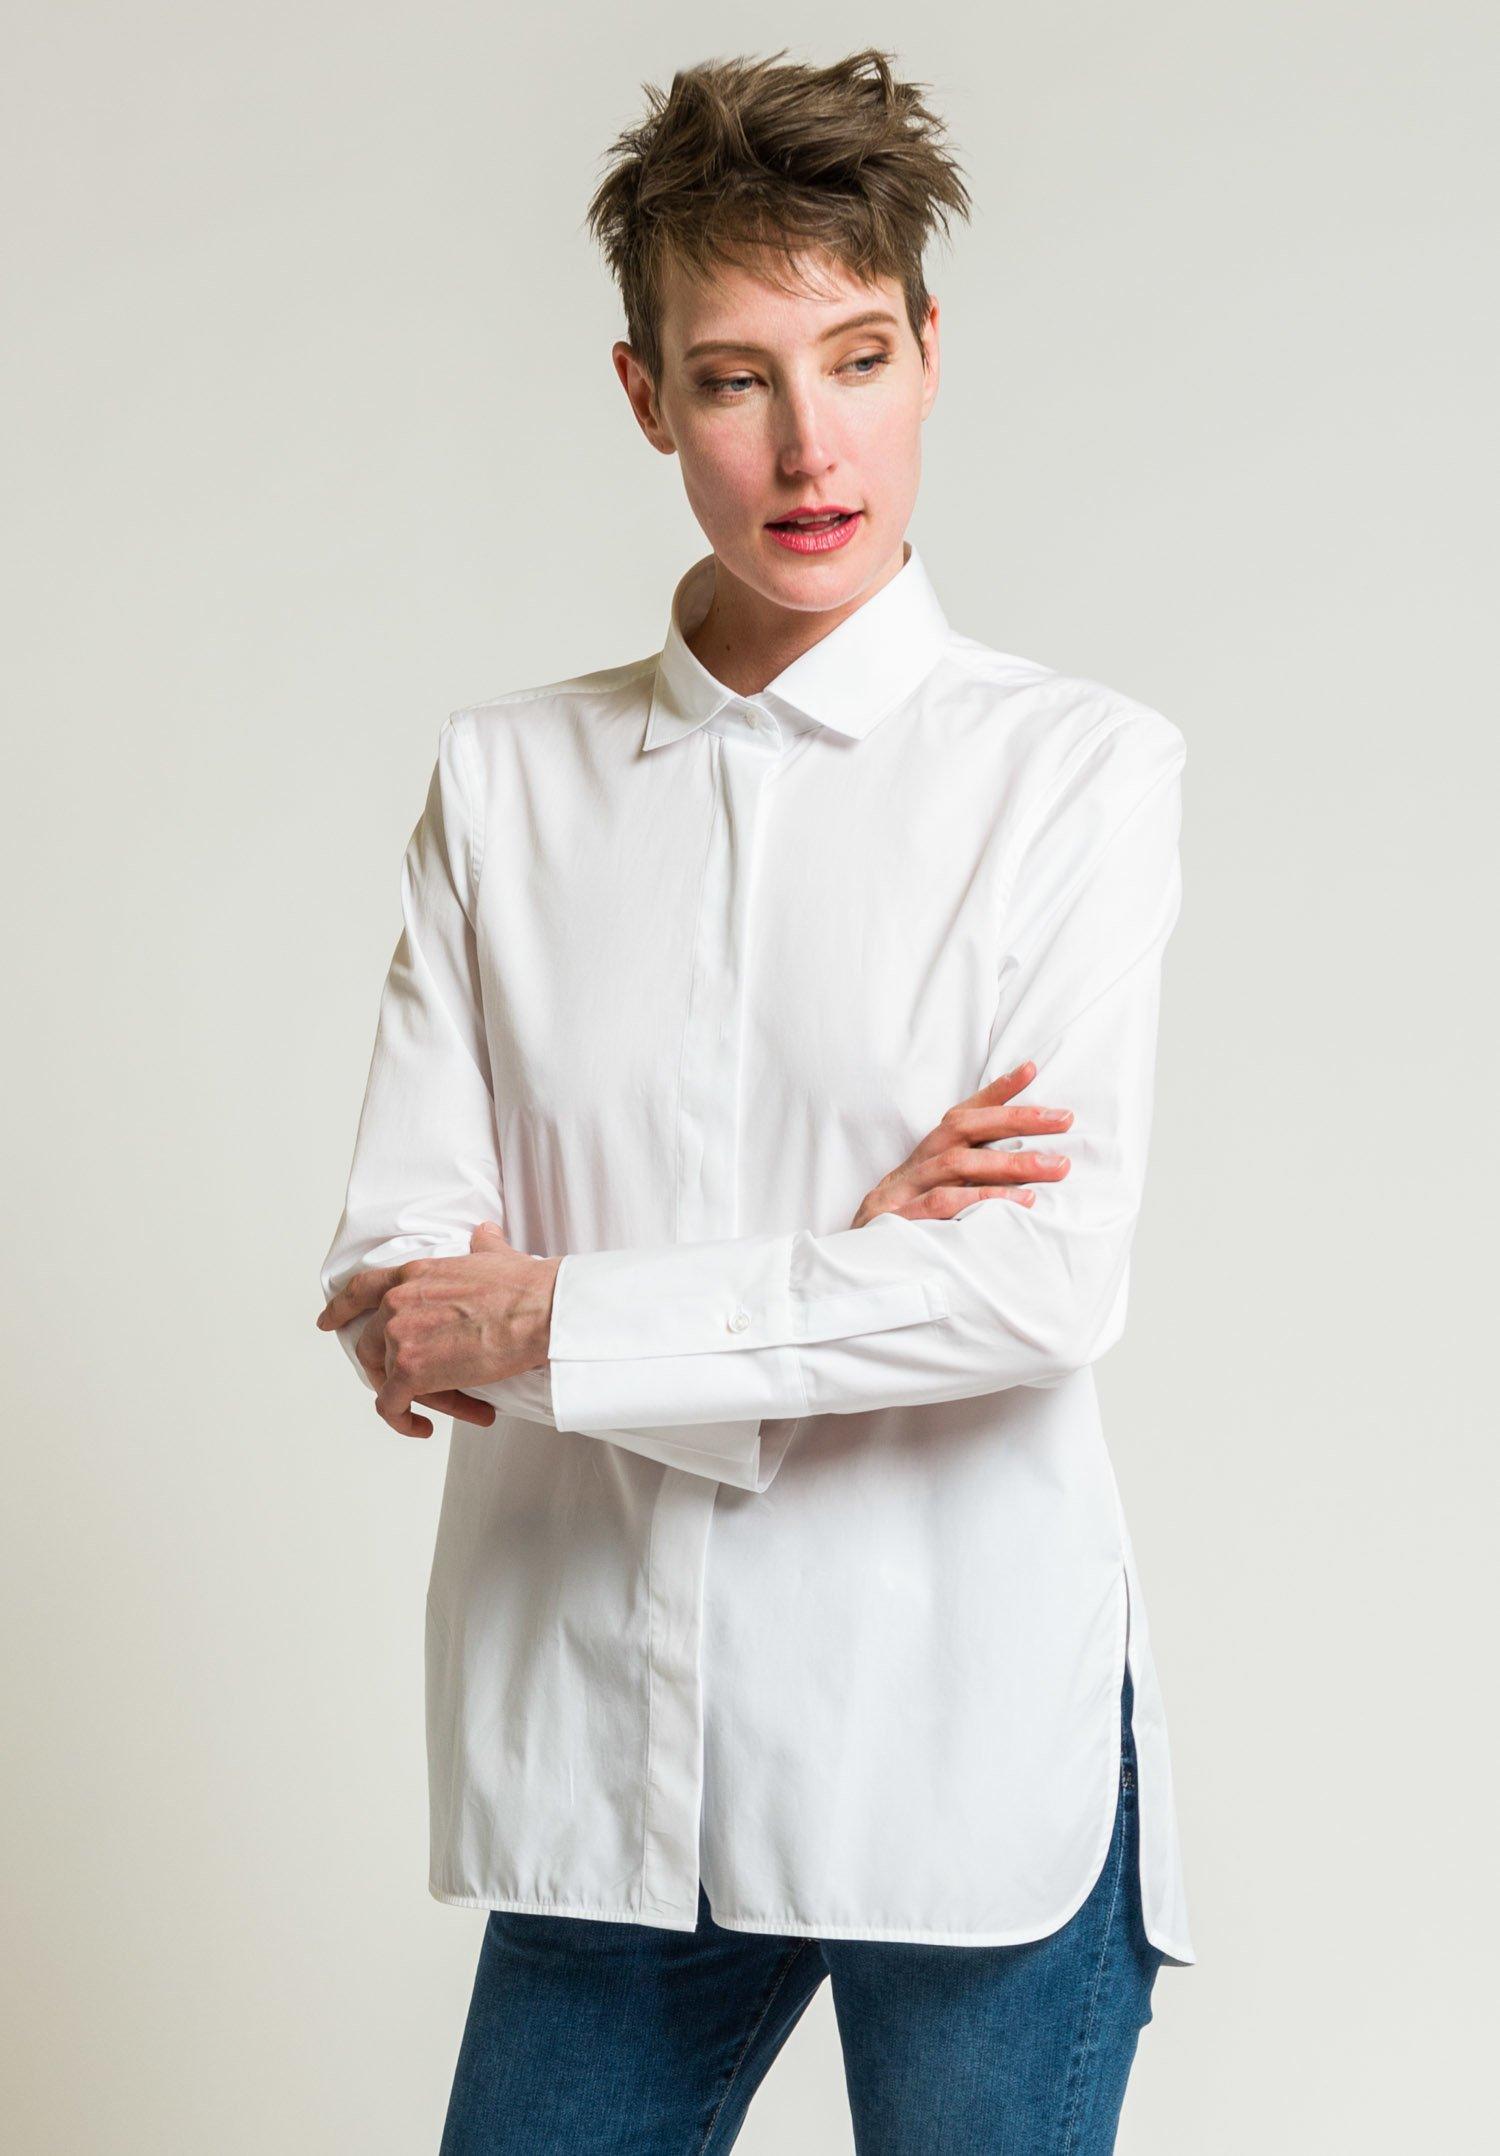 SHIRTS - Shirts Lareida Original Best Store To Get StTxY